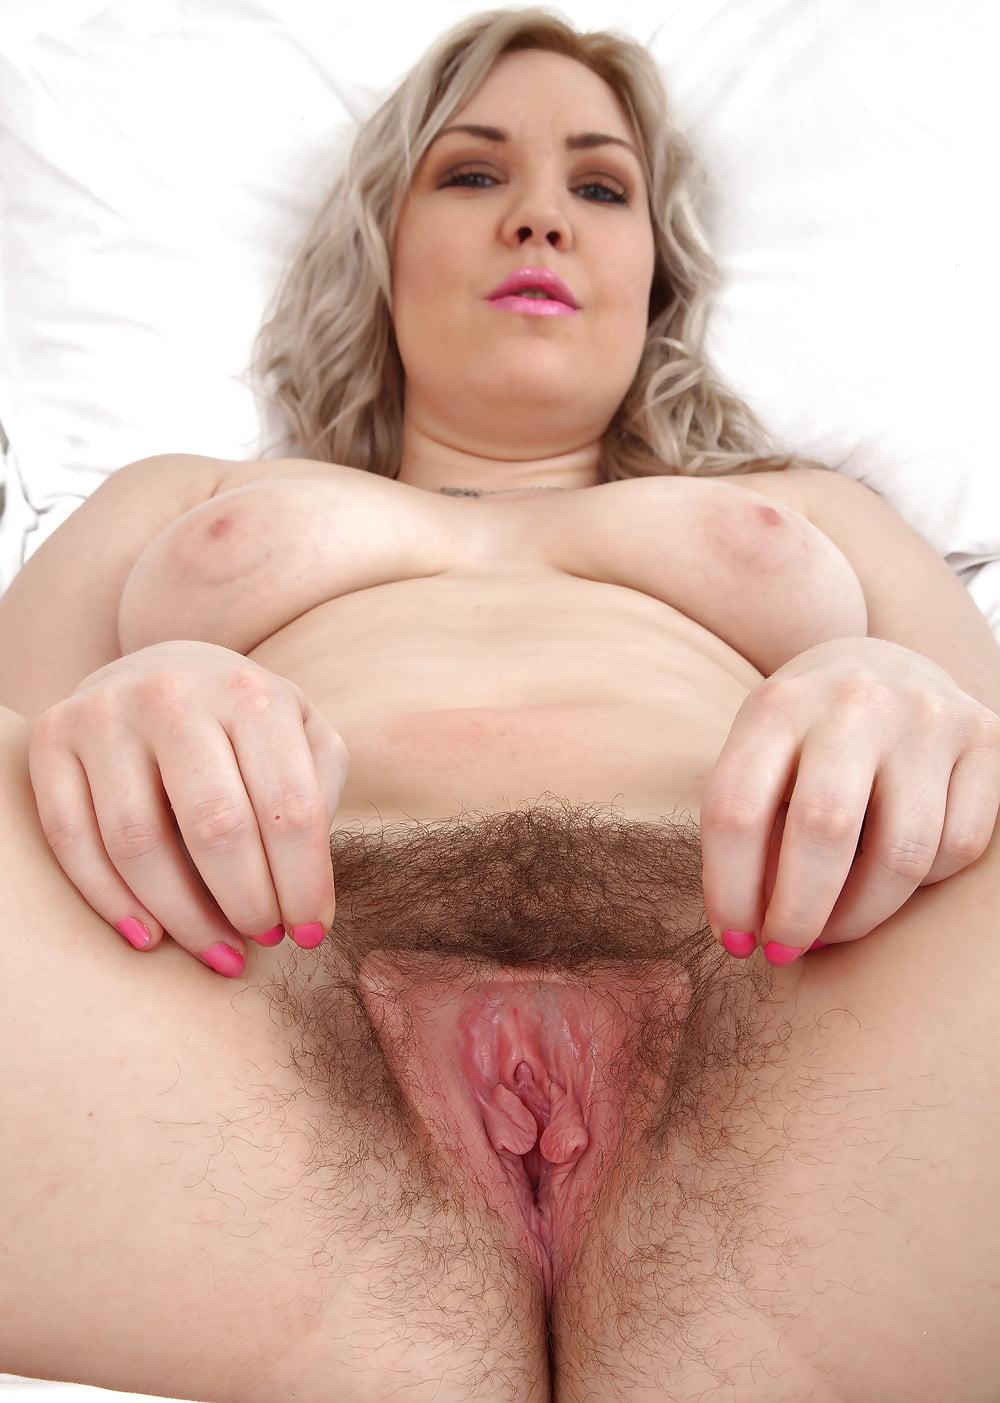 Chubby Hairy Mature Blonde Daisy - 106 Pics  Xhamster-8507